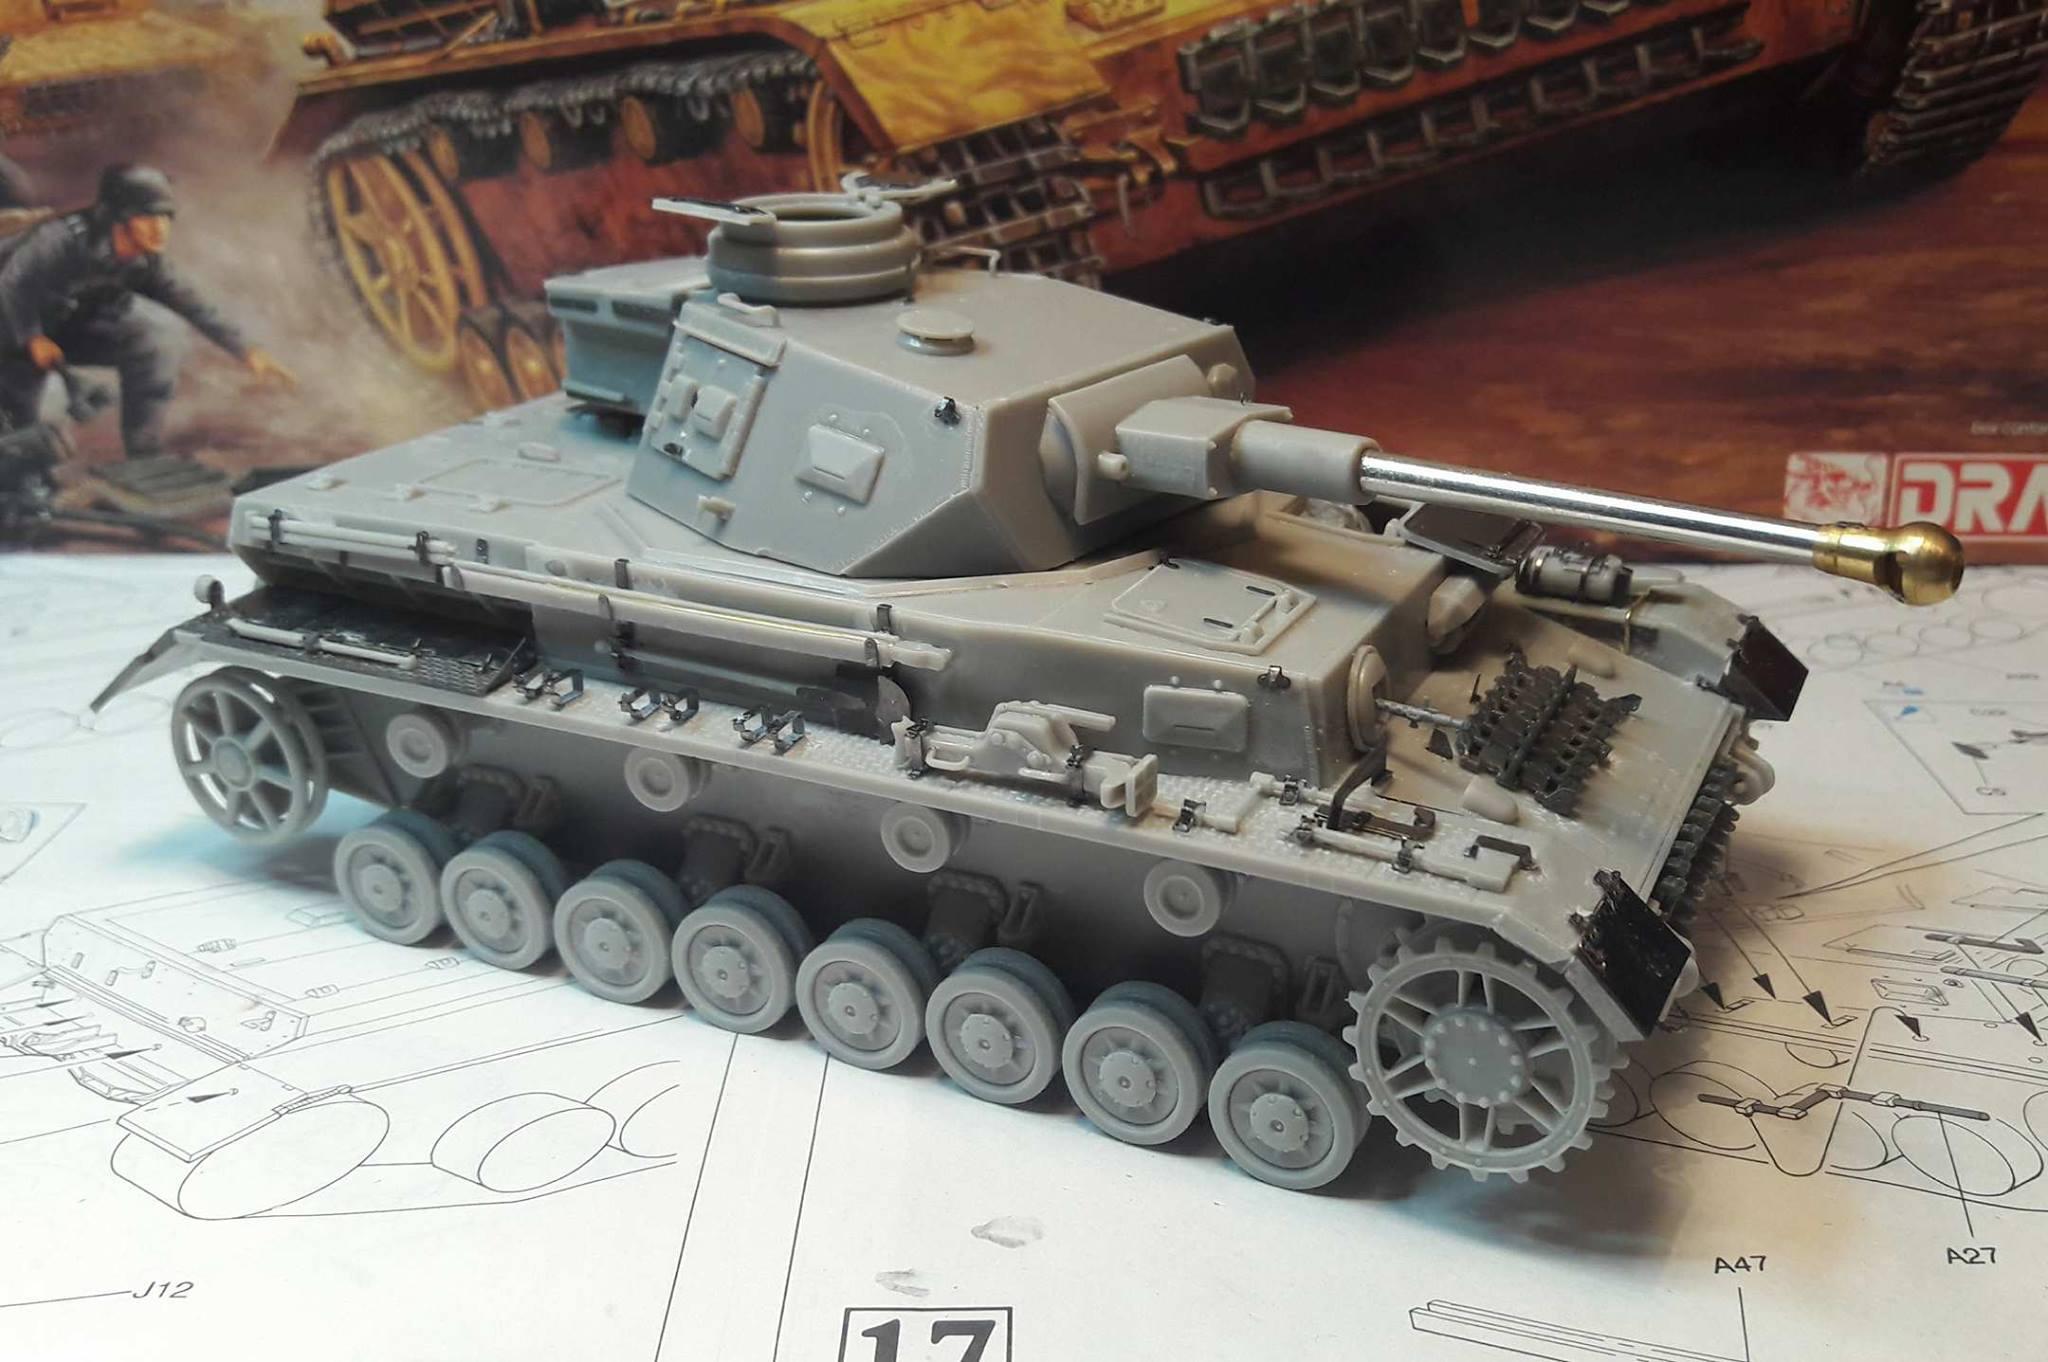 PzKpfw. IV Ausf. F2 - Dragon - Page 2 22881121191080102121914089949691092654988o